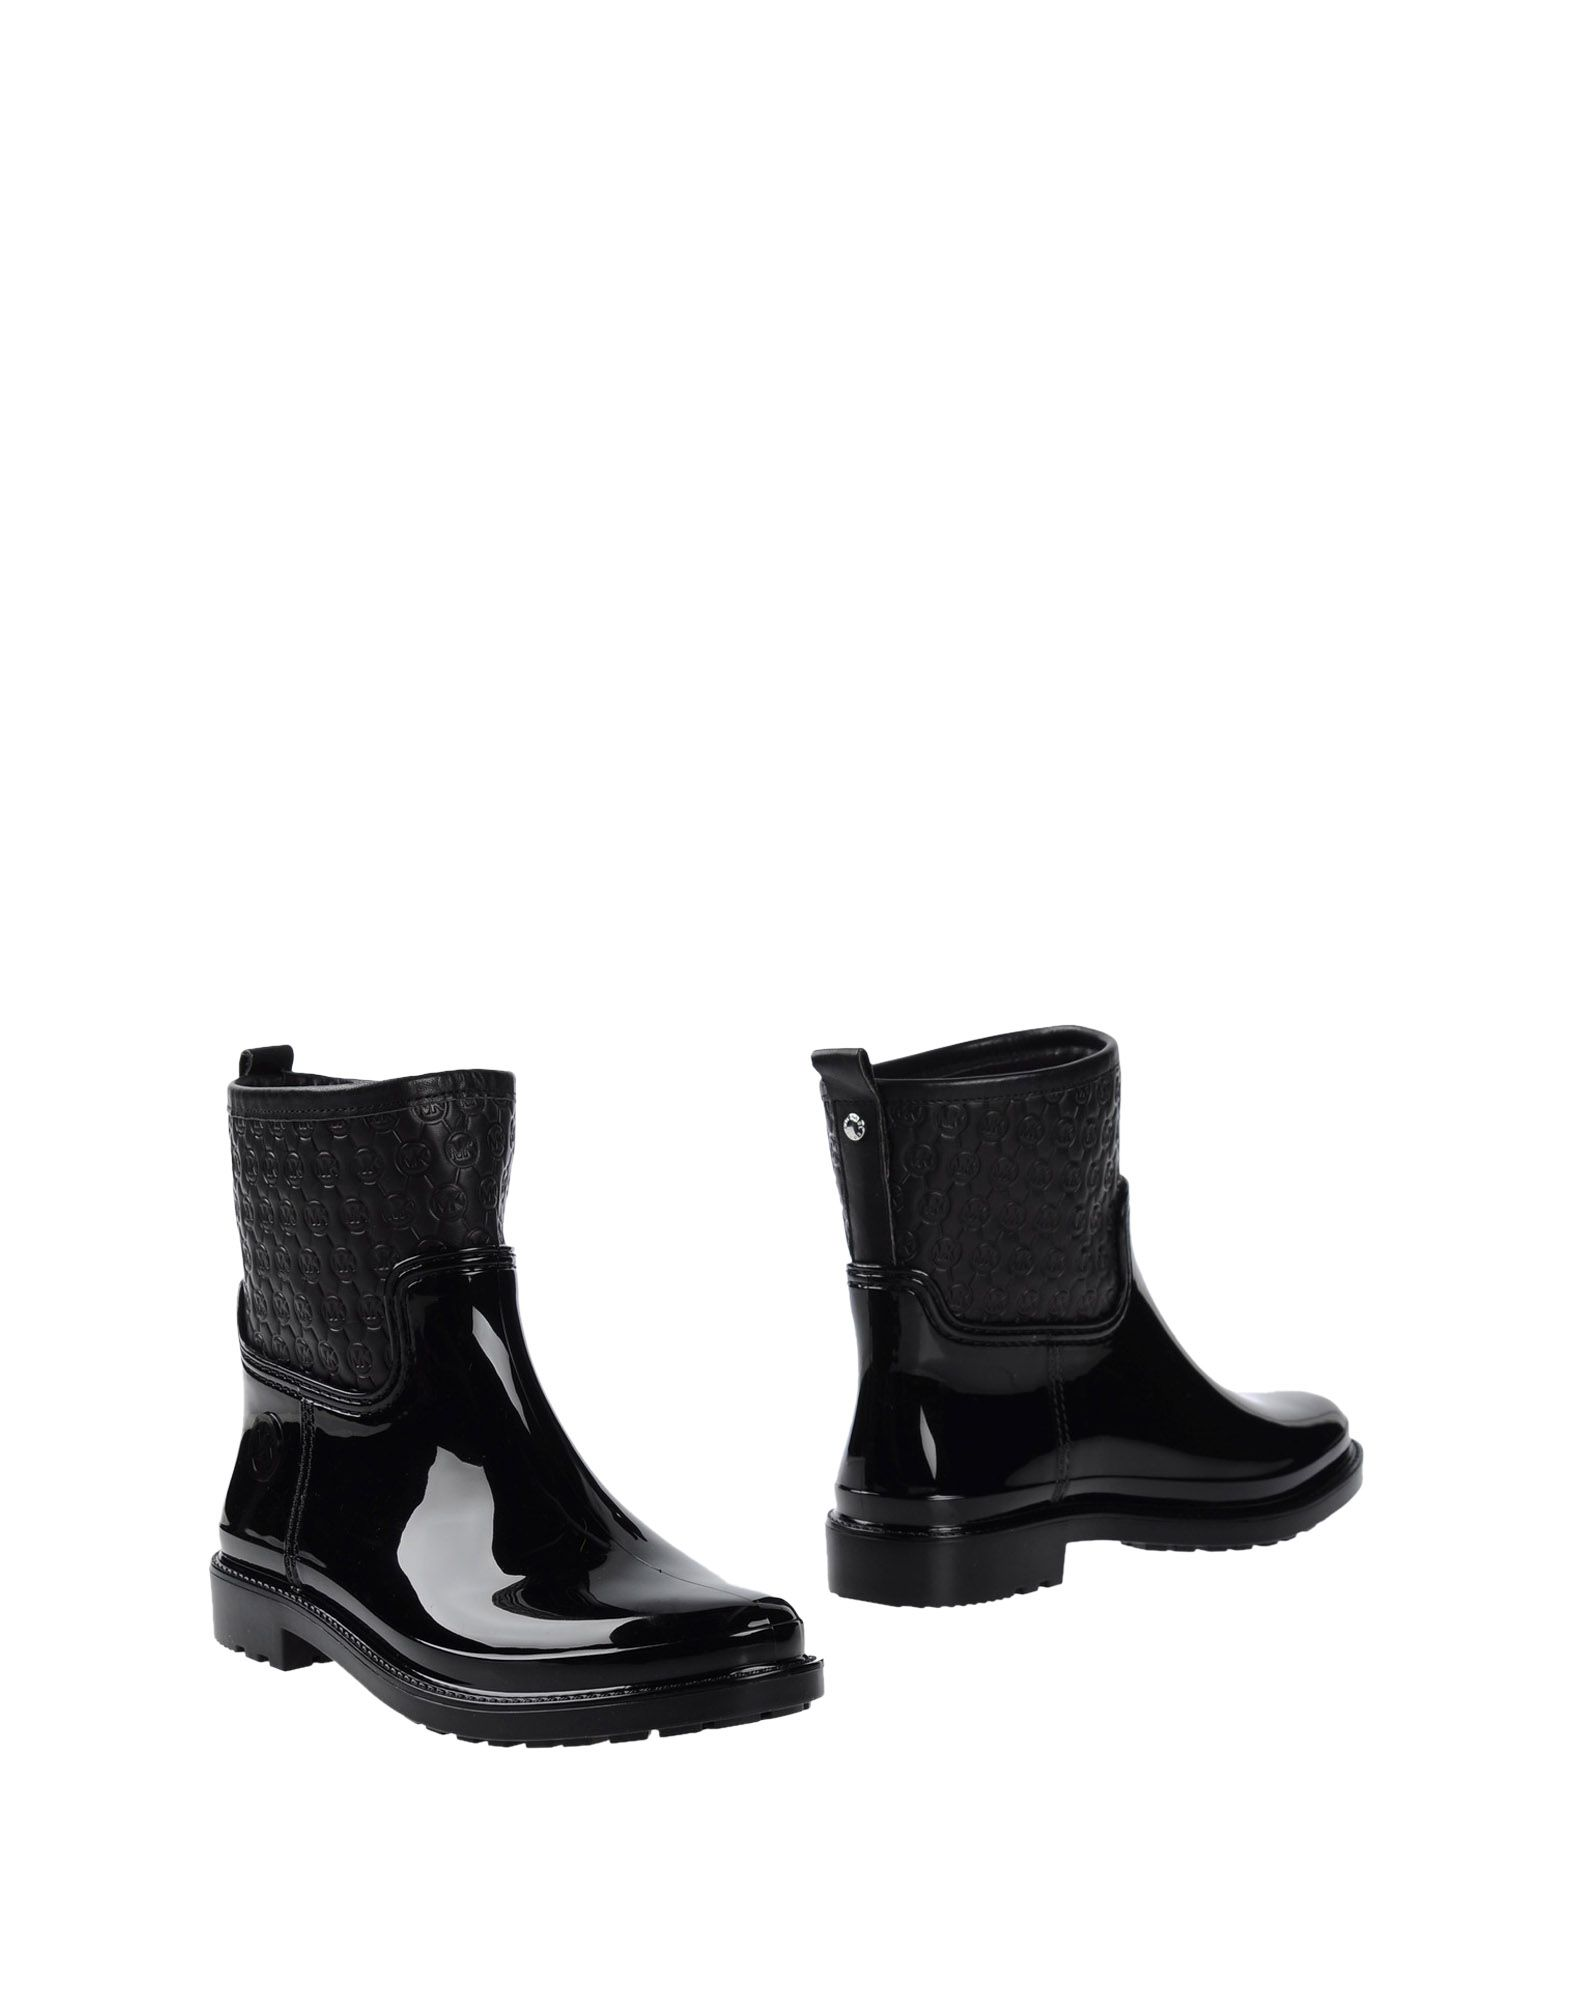 MICHAEL MICHAEL KORS Полусапоги и высокие ботинки michael michael kors ботинки